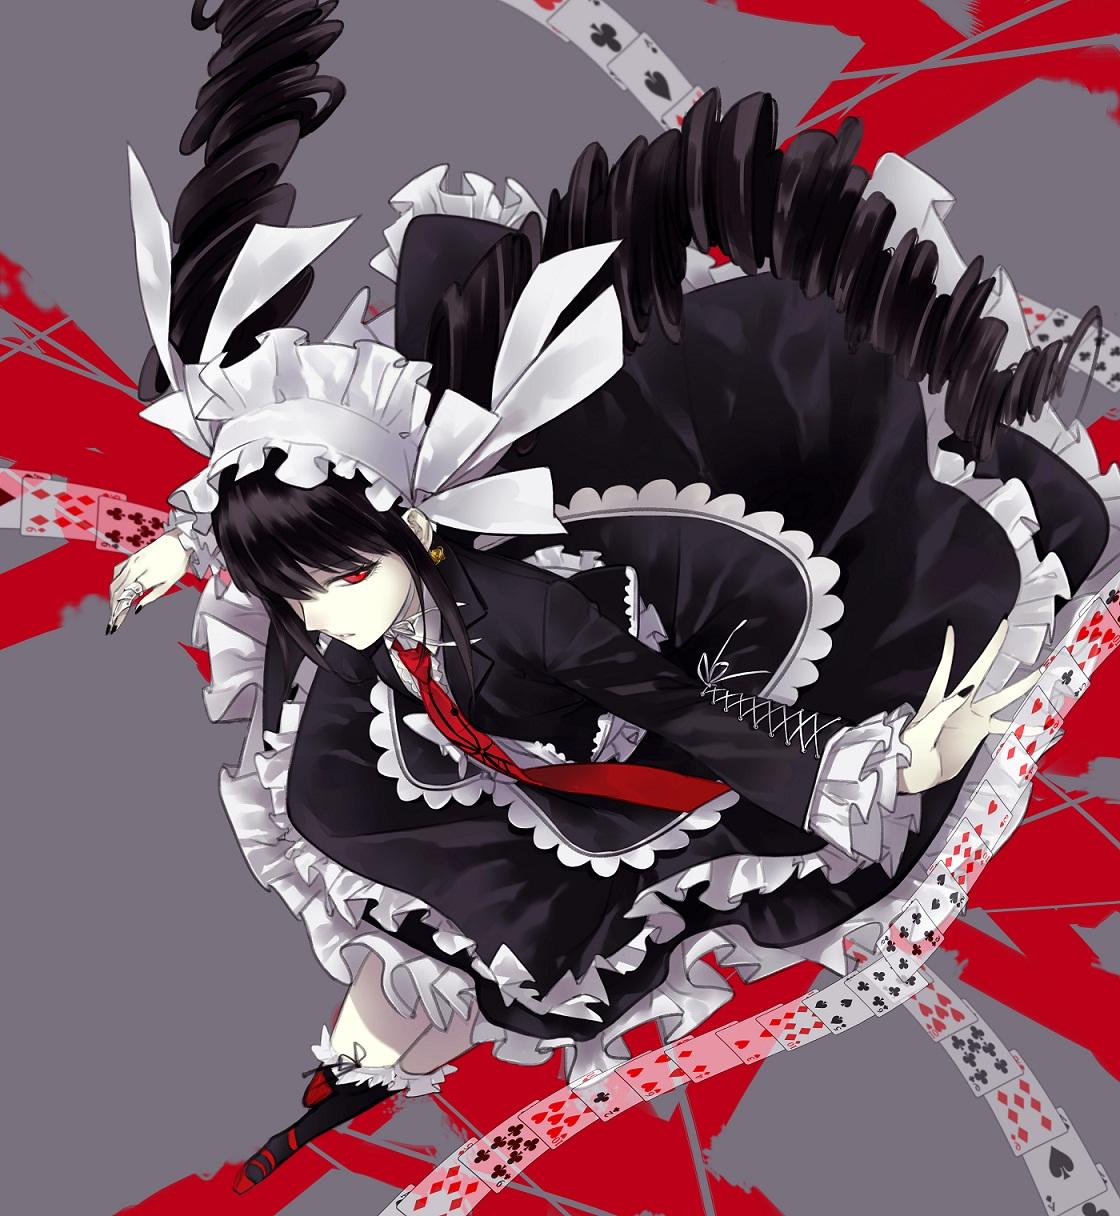 Celestia Ludenberg Danganronpa Zerochan Anime Image Board